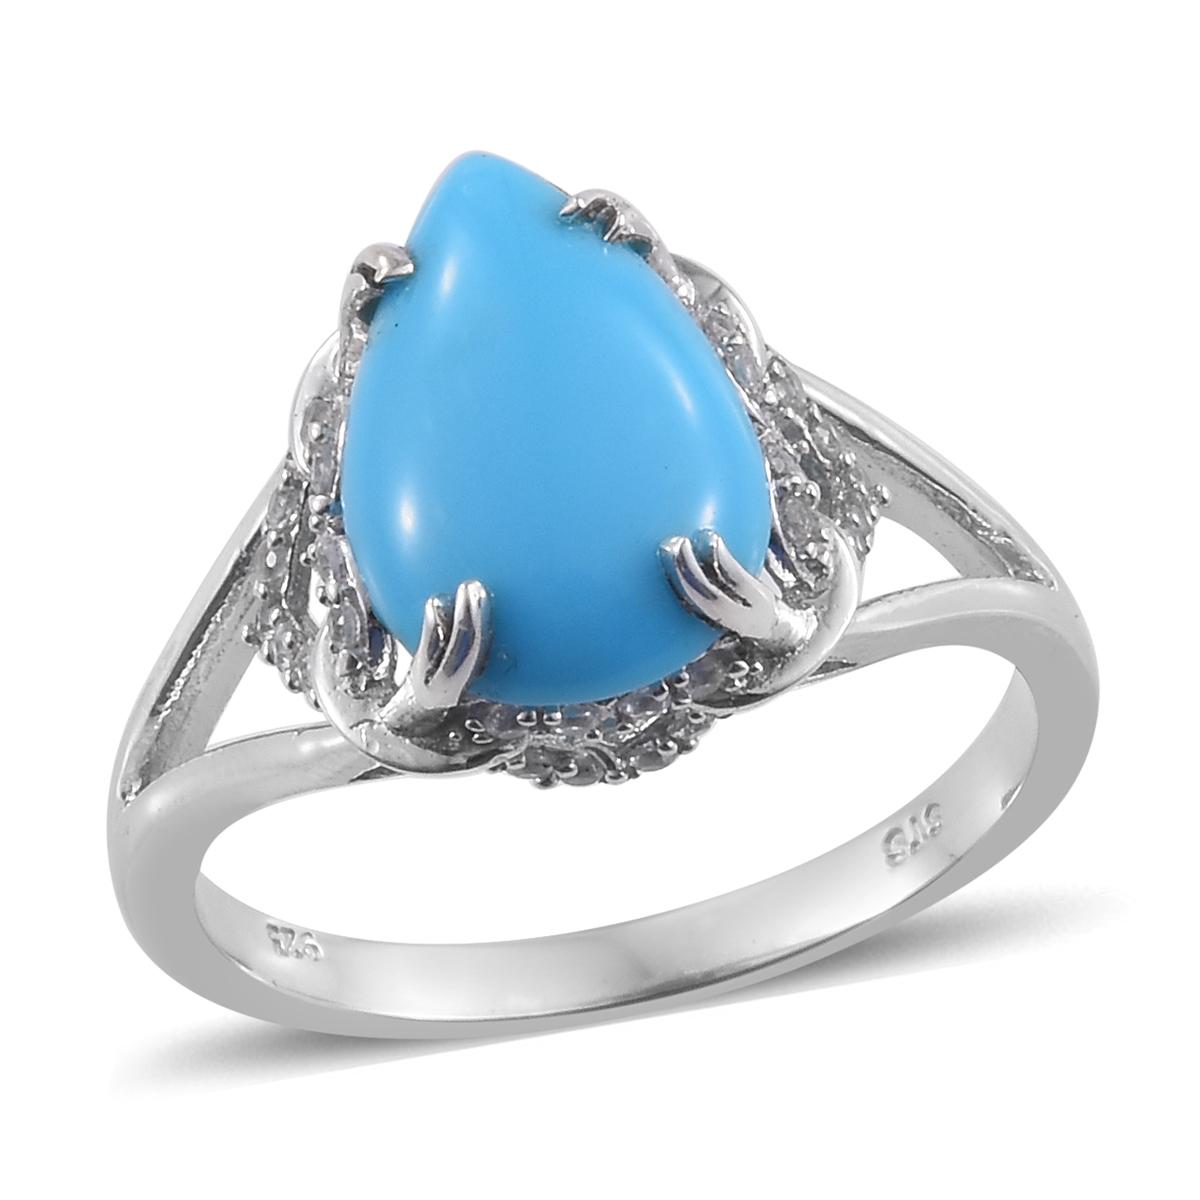 032355ba0fc901 Arizona Sleeping Beauty Turquoise, Cambodian Zircon Platinum Over Sterling  Silver Ring (Size 11.0) TGW 5.11 cts. | Arizona-Sleeping-Beauty-Turquoise  ...